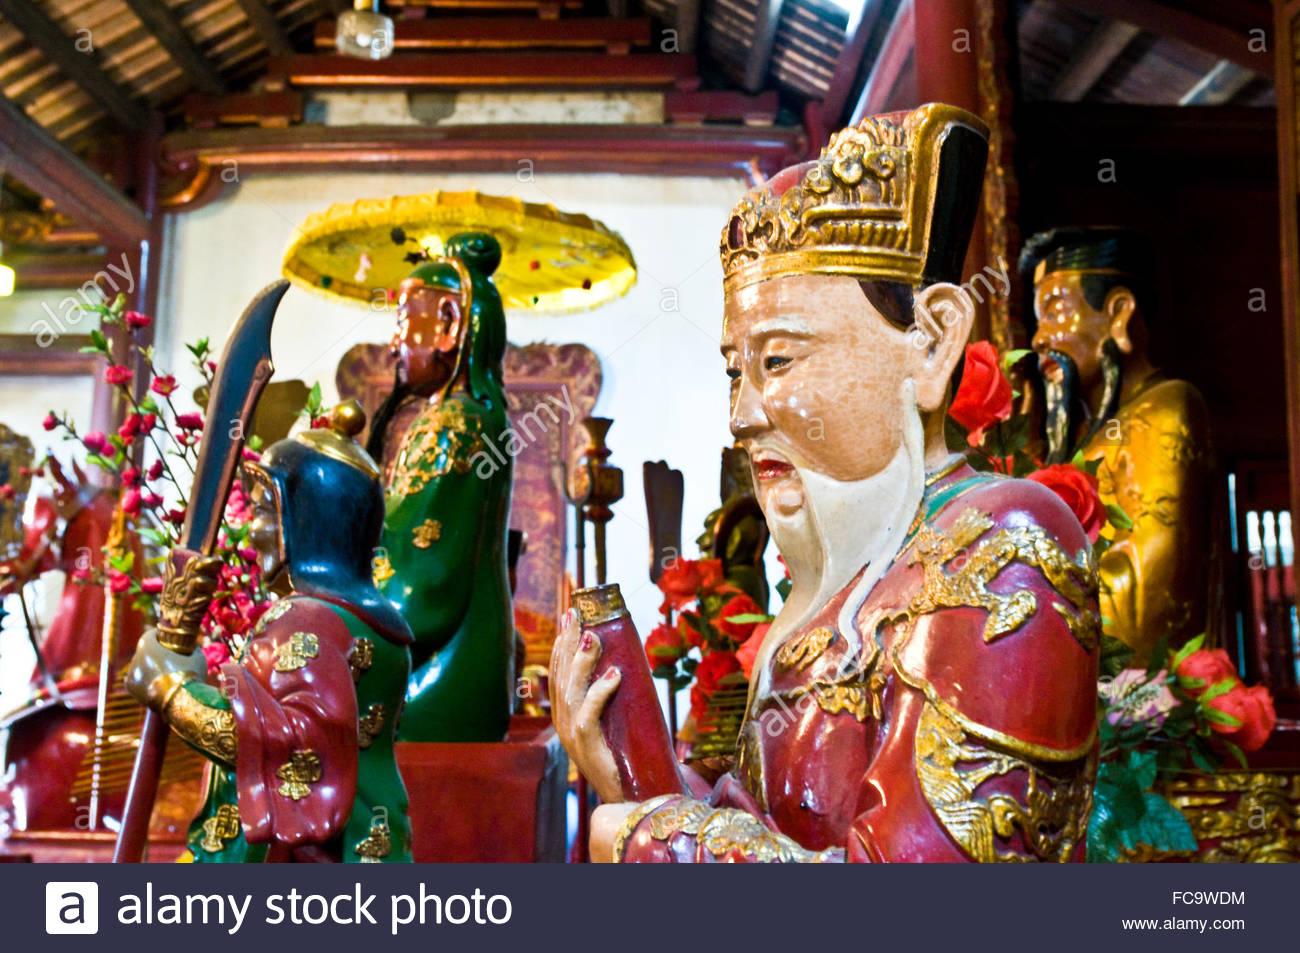 Ngoc Son Temple - Stock Image